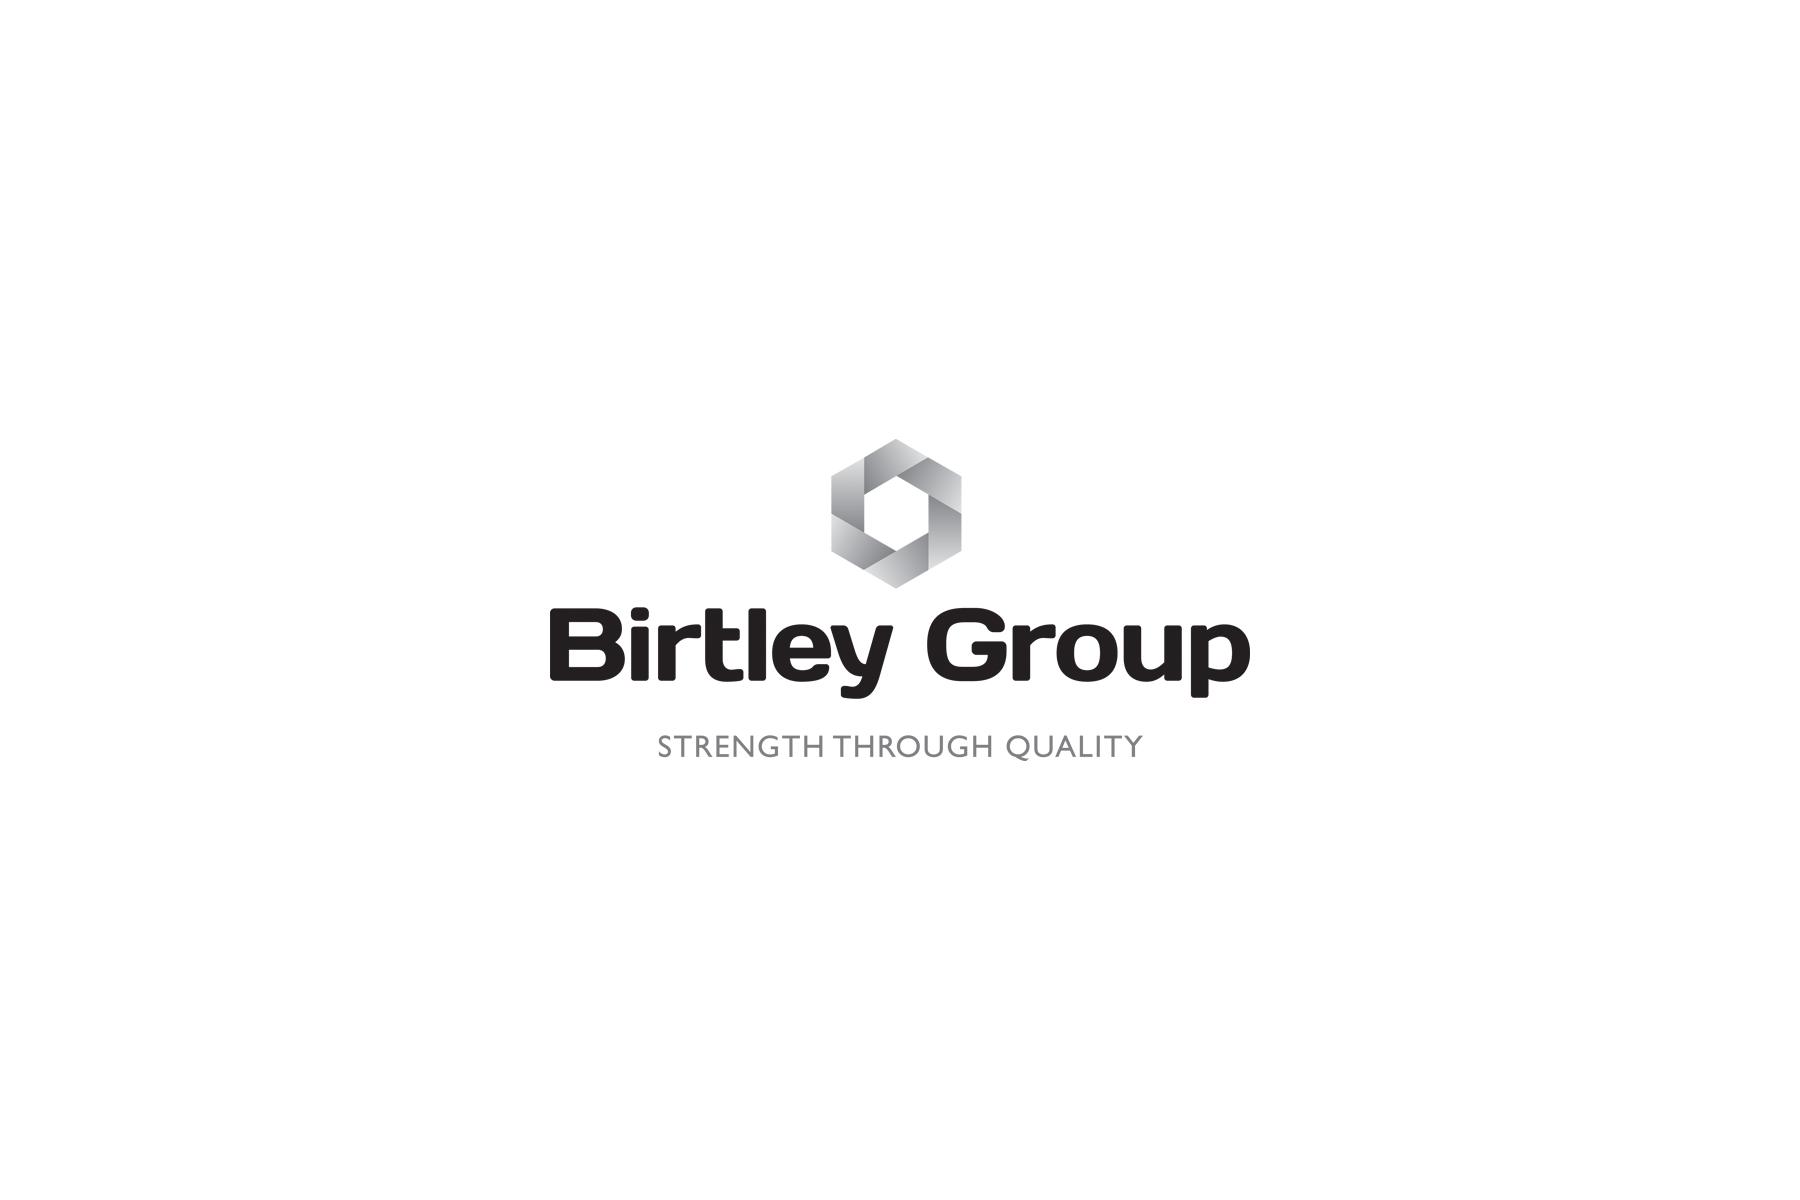 birtley group logo